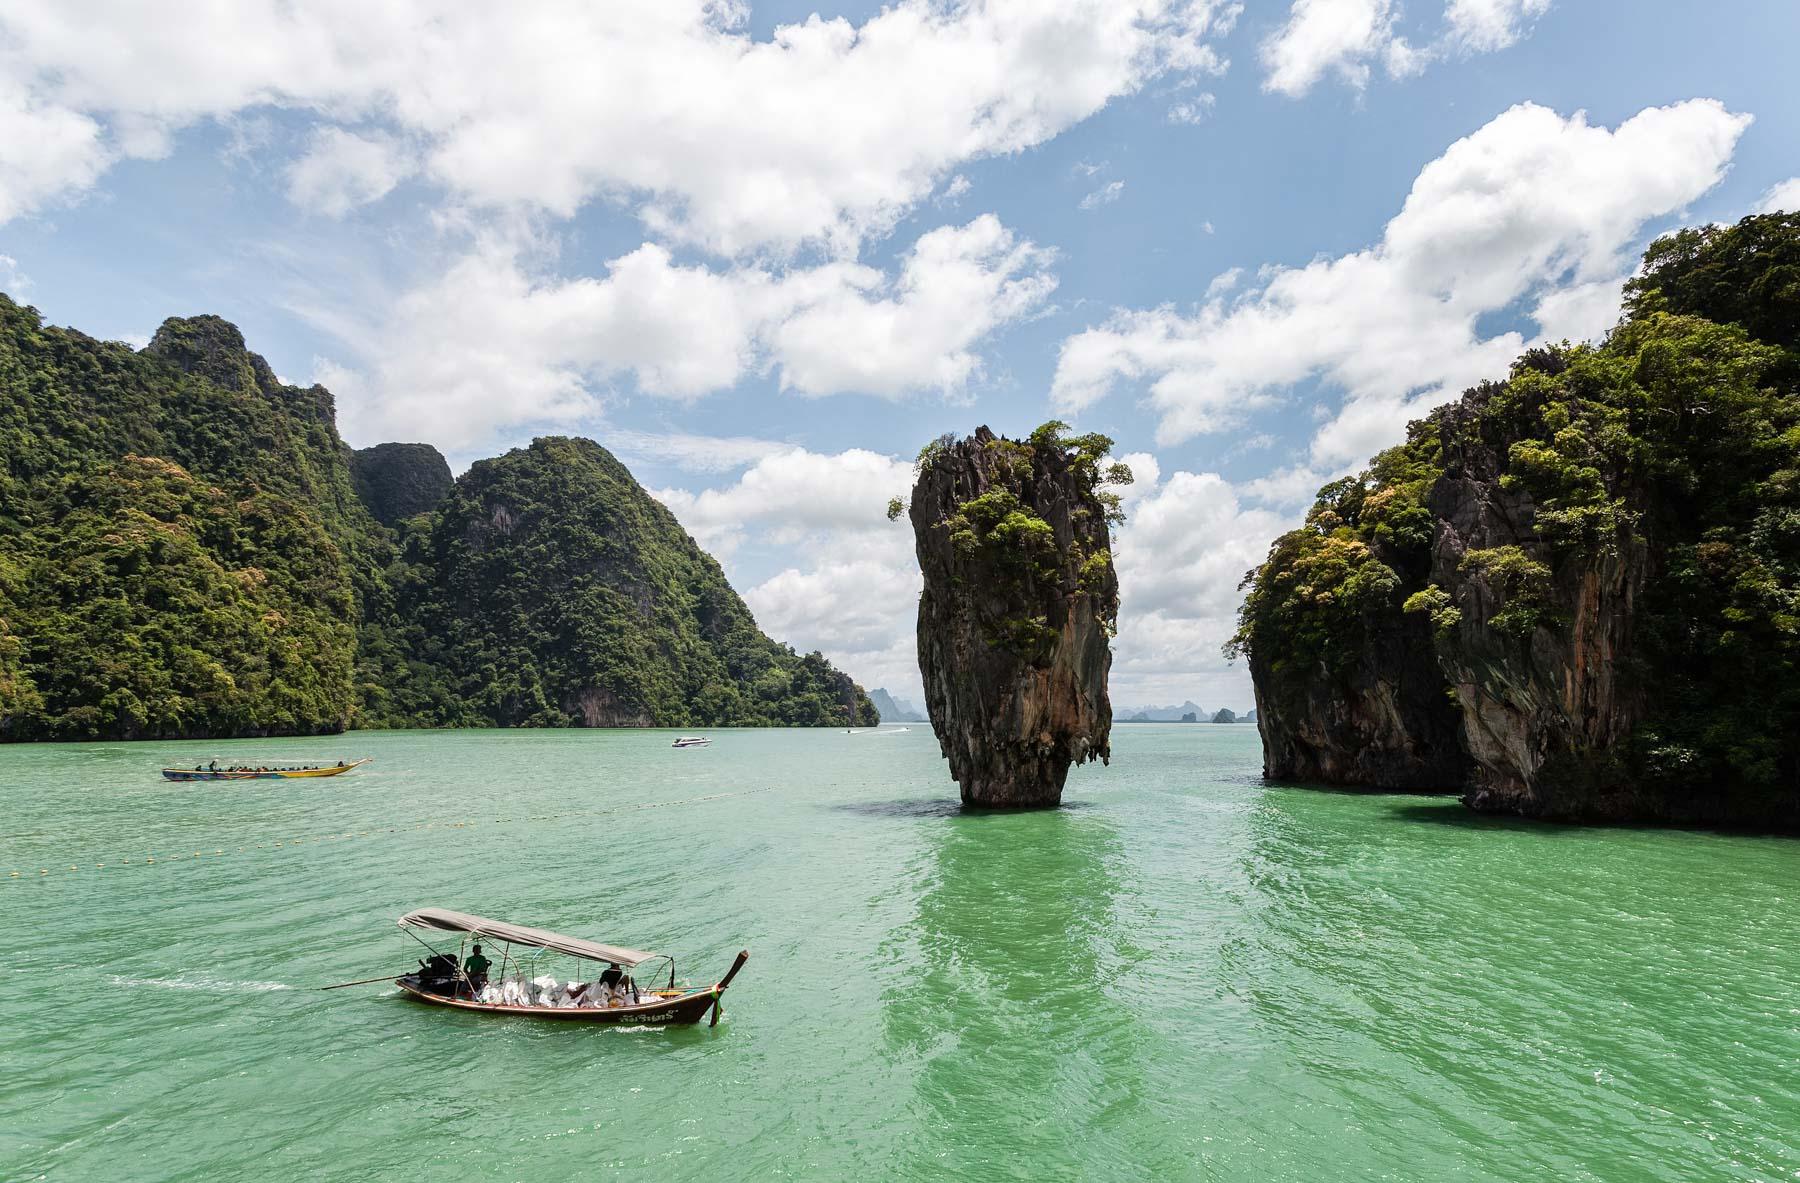 Les endroits magiques en Thaïlande